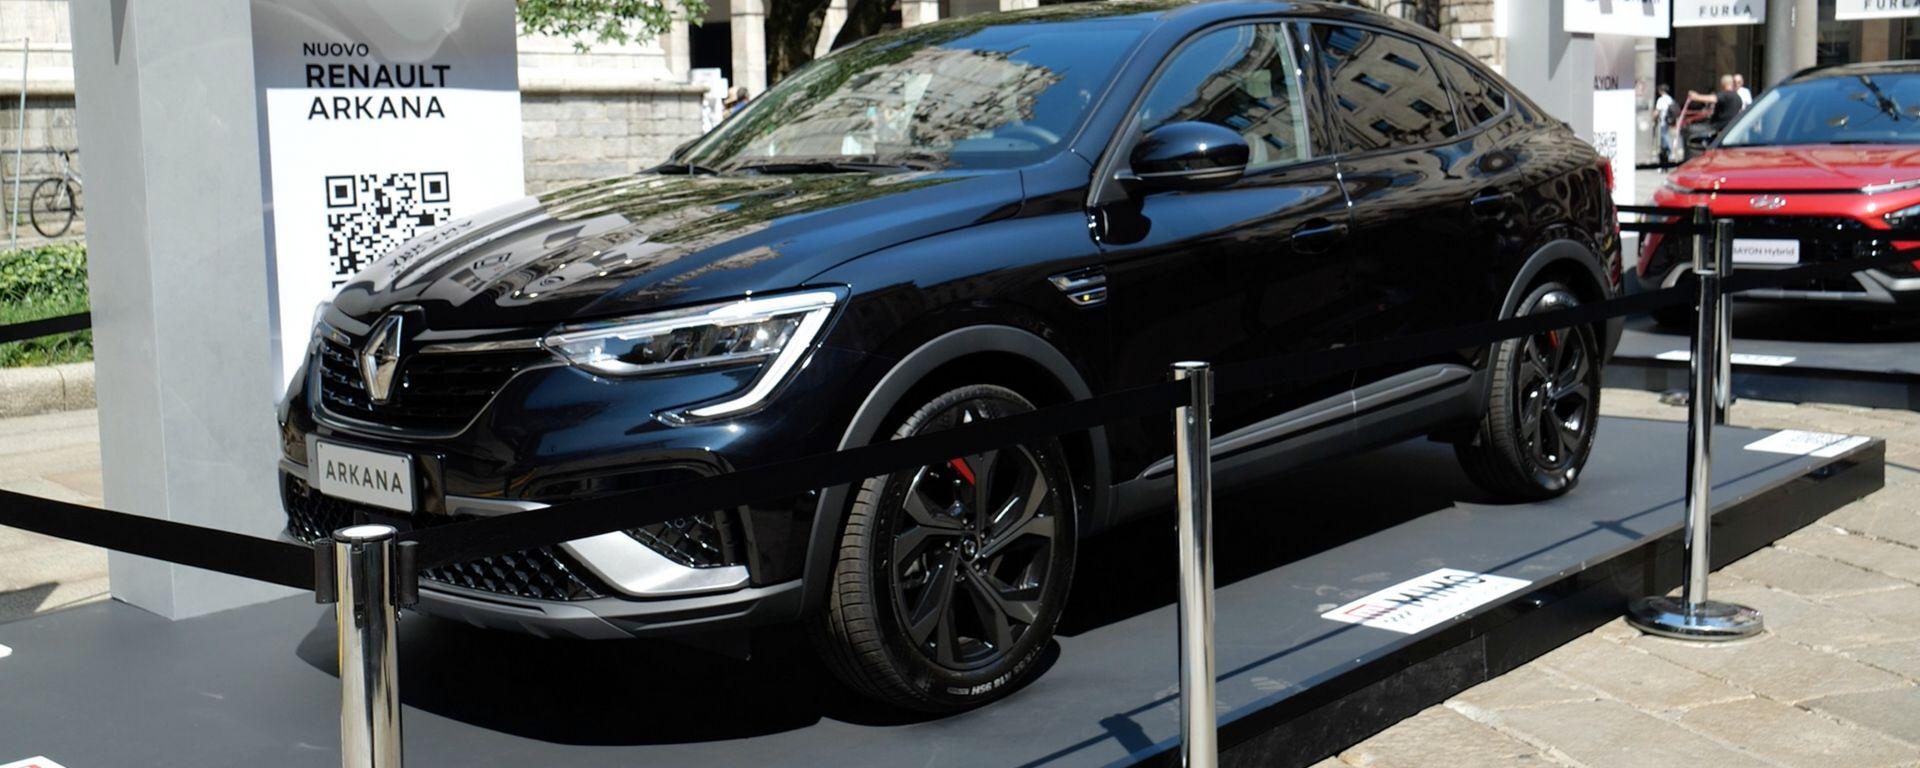 Nuova Renault Arkana, MIMO 2021